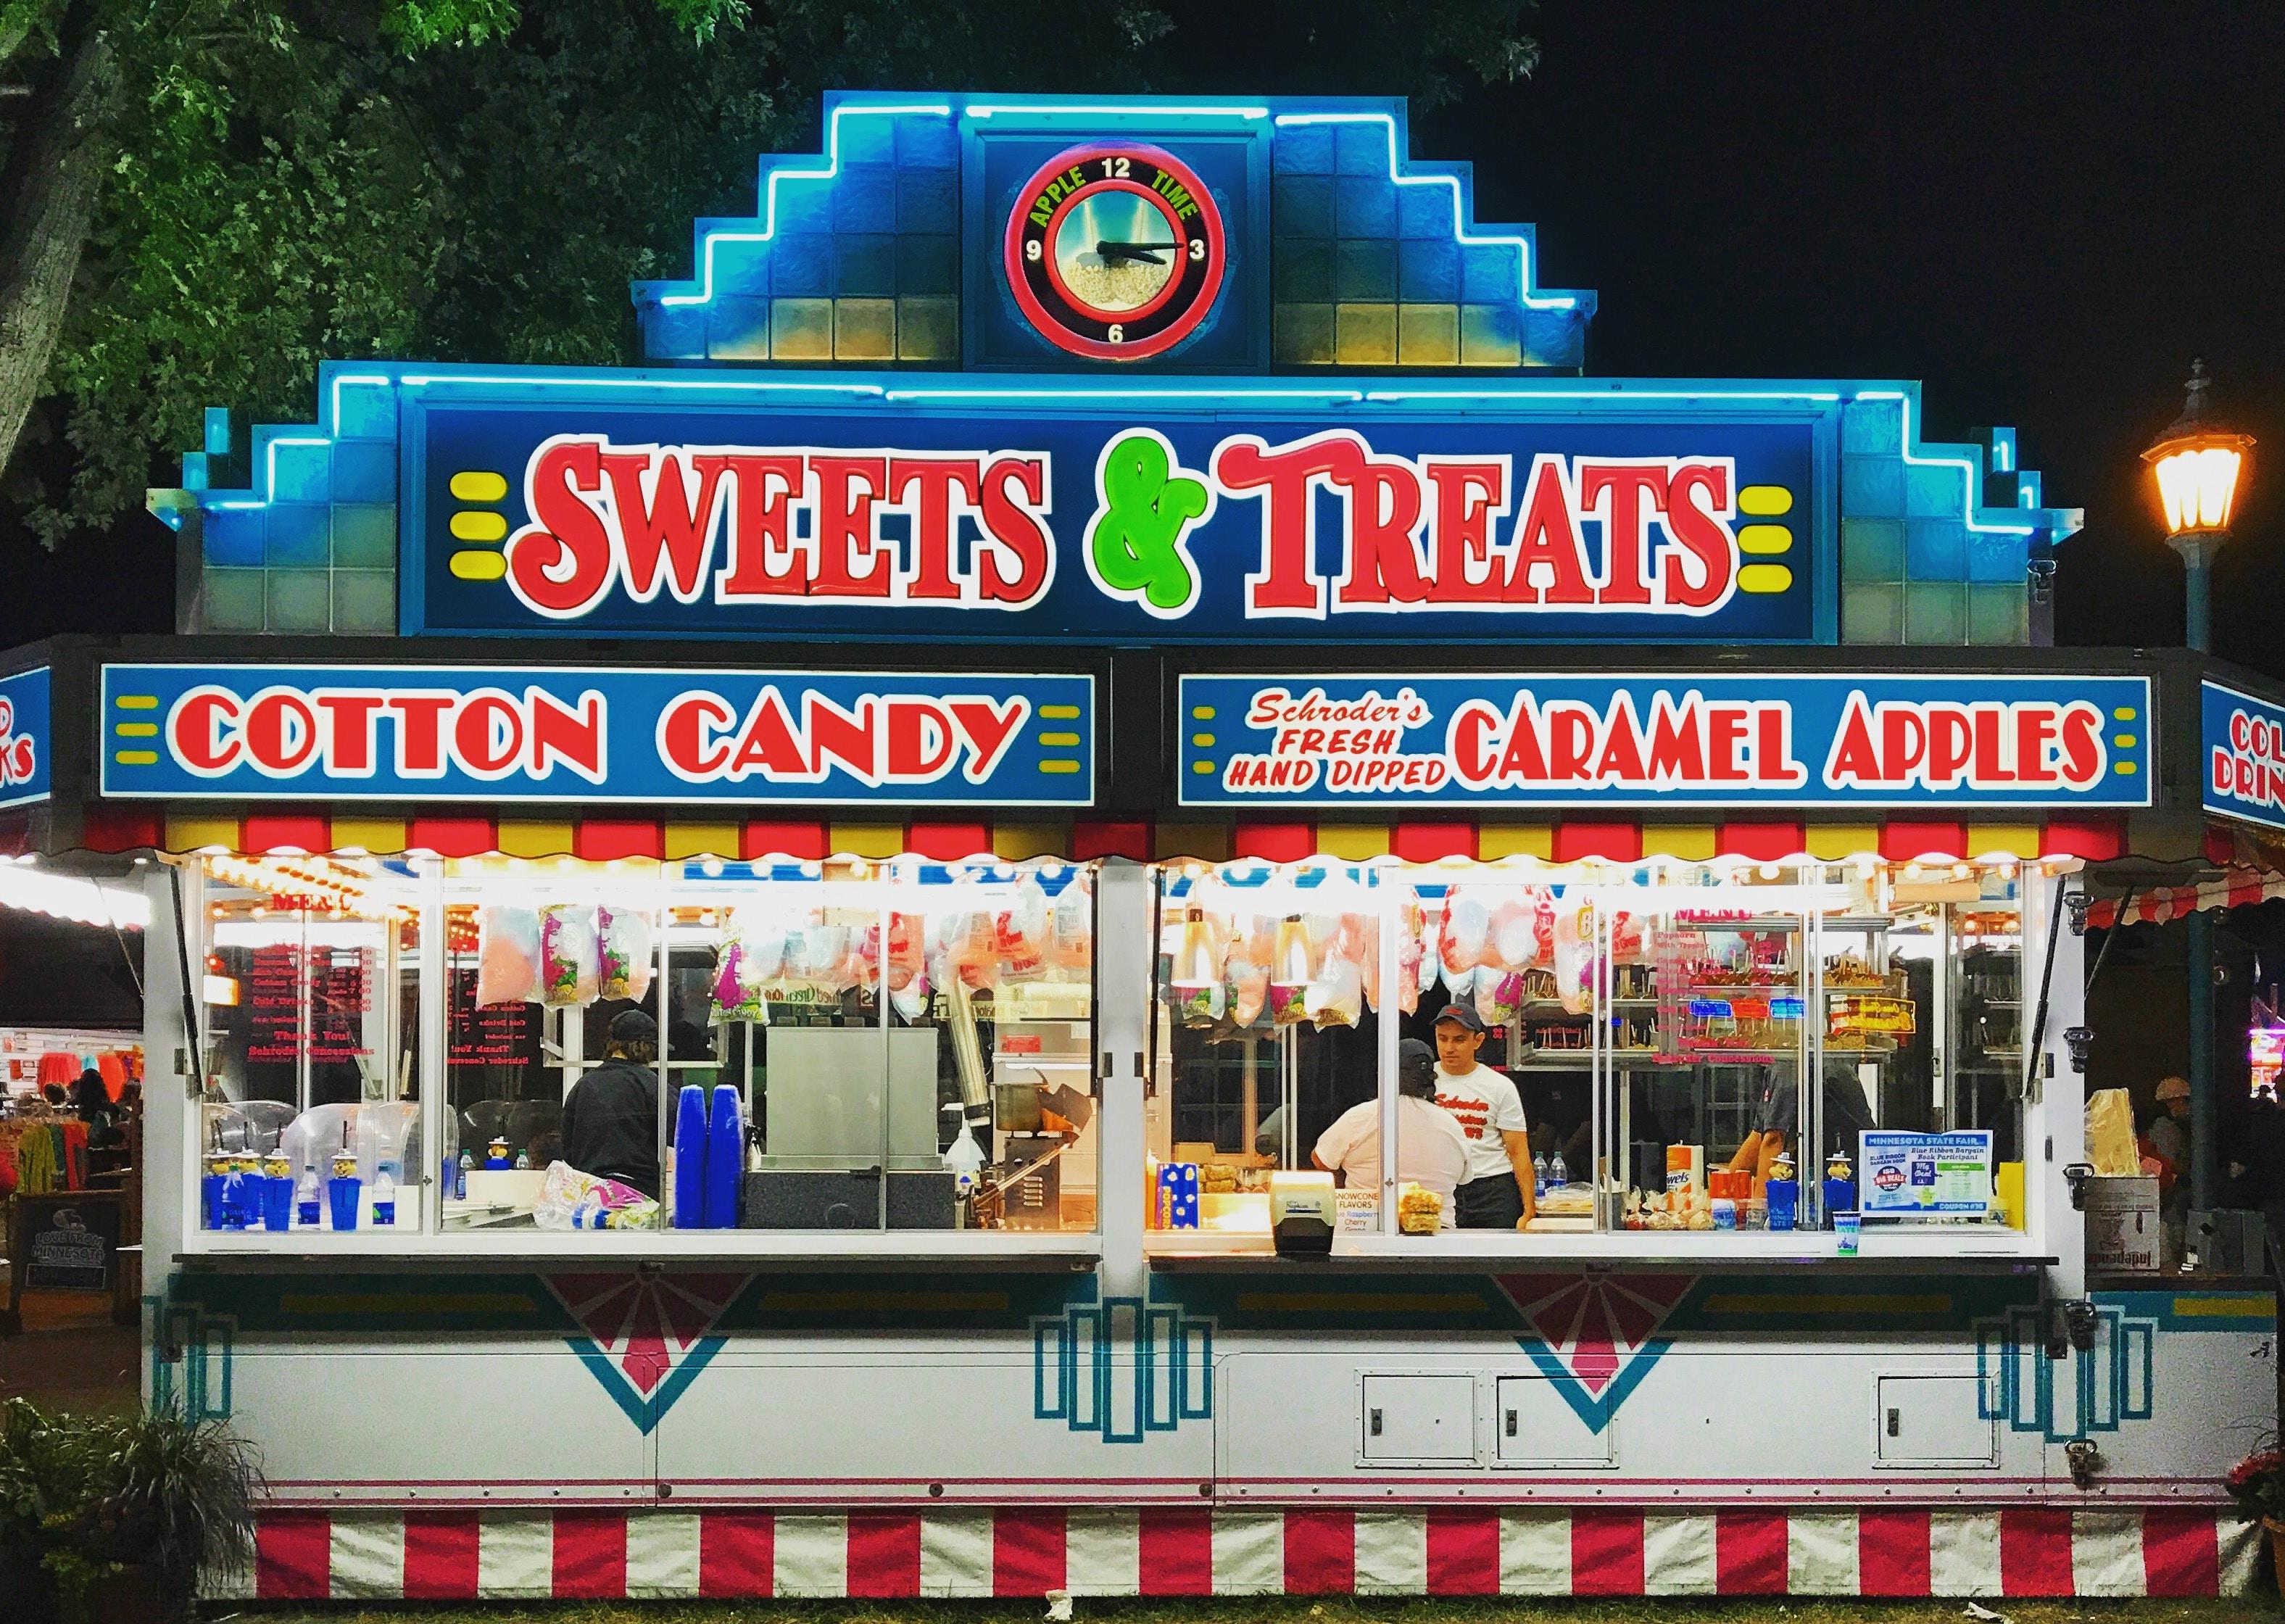 Sweets & Treats food stall